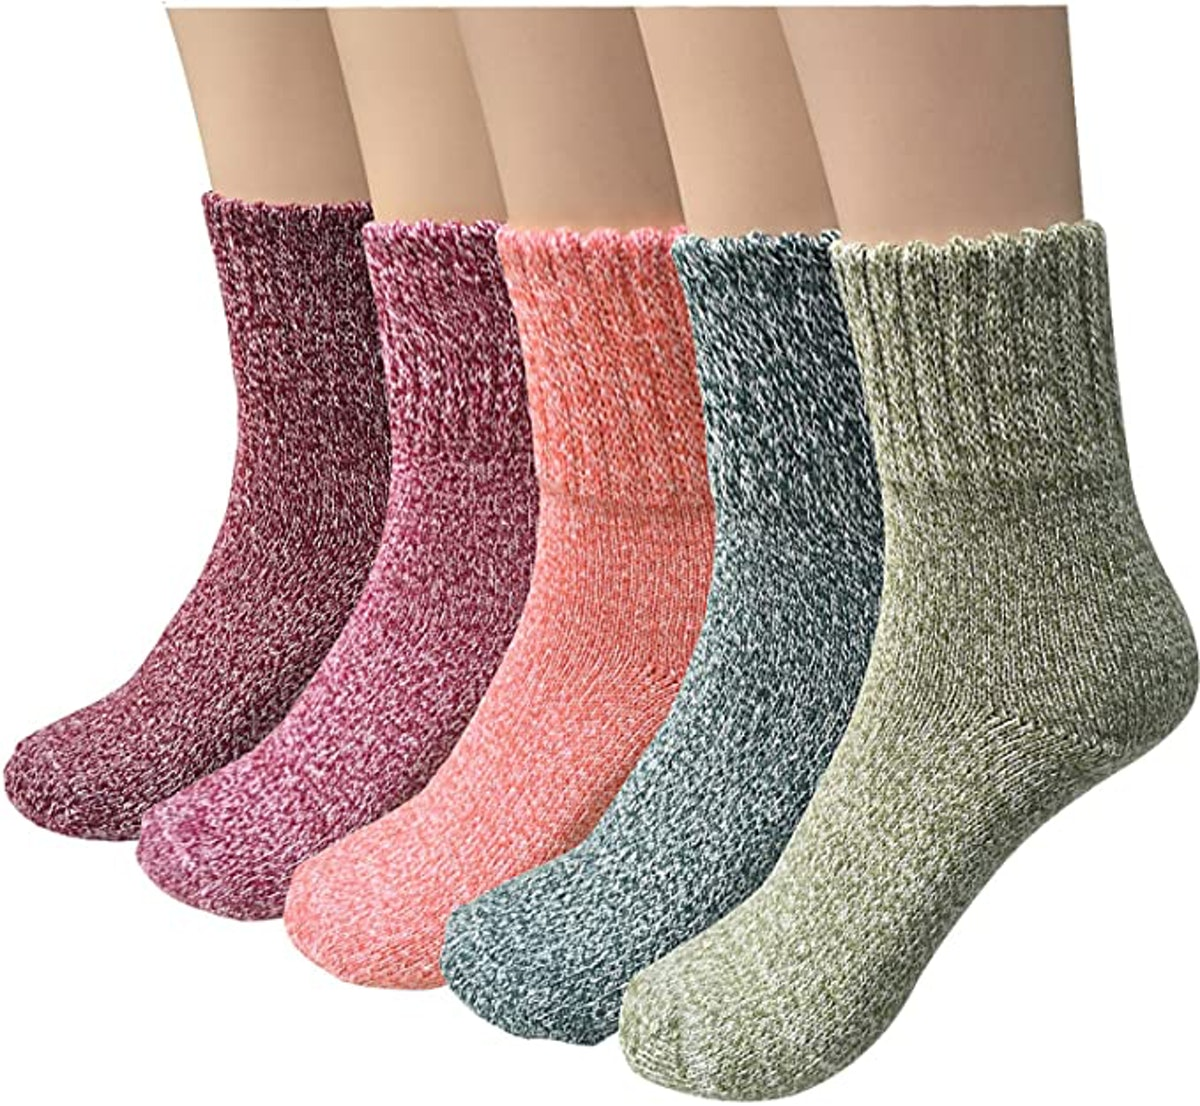 YSense Winter Warm Socks (5-Pairs)